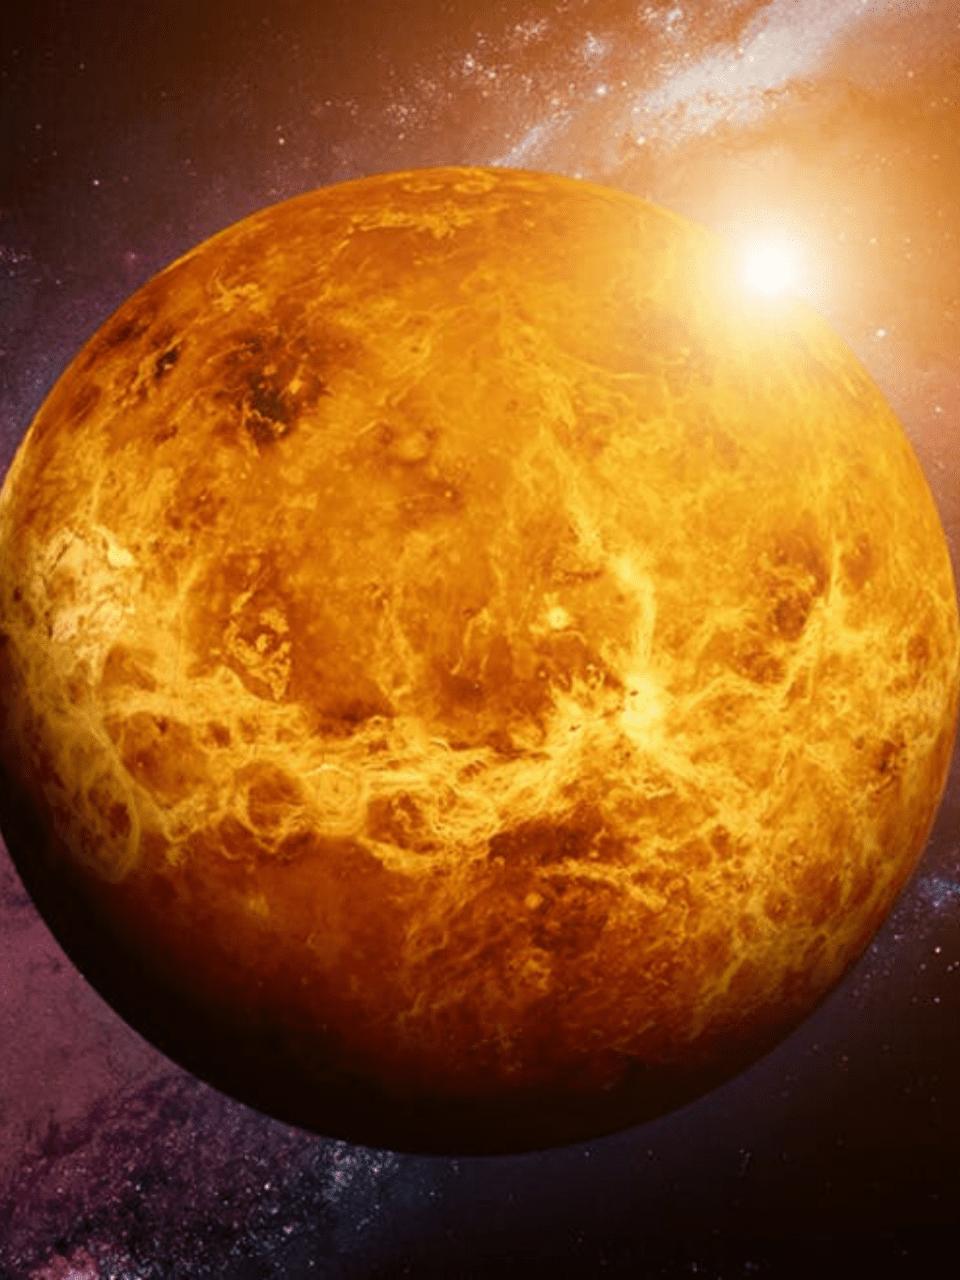 https://zachh.lt/wp-content/uploads/2020/01/veneros-planeta1-960x1280.png